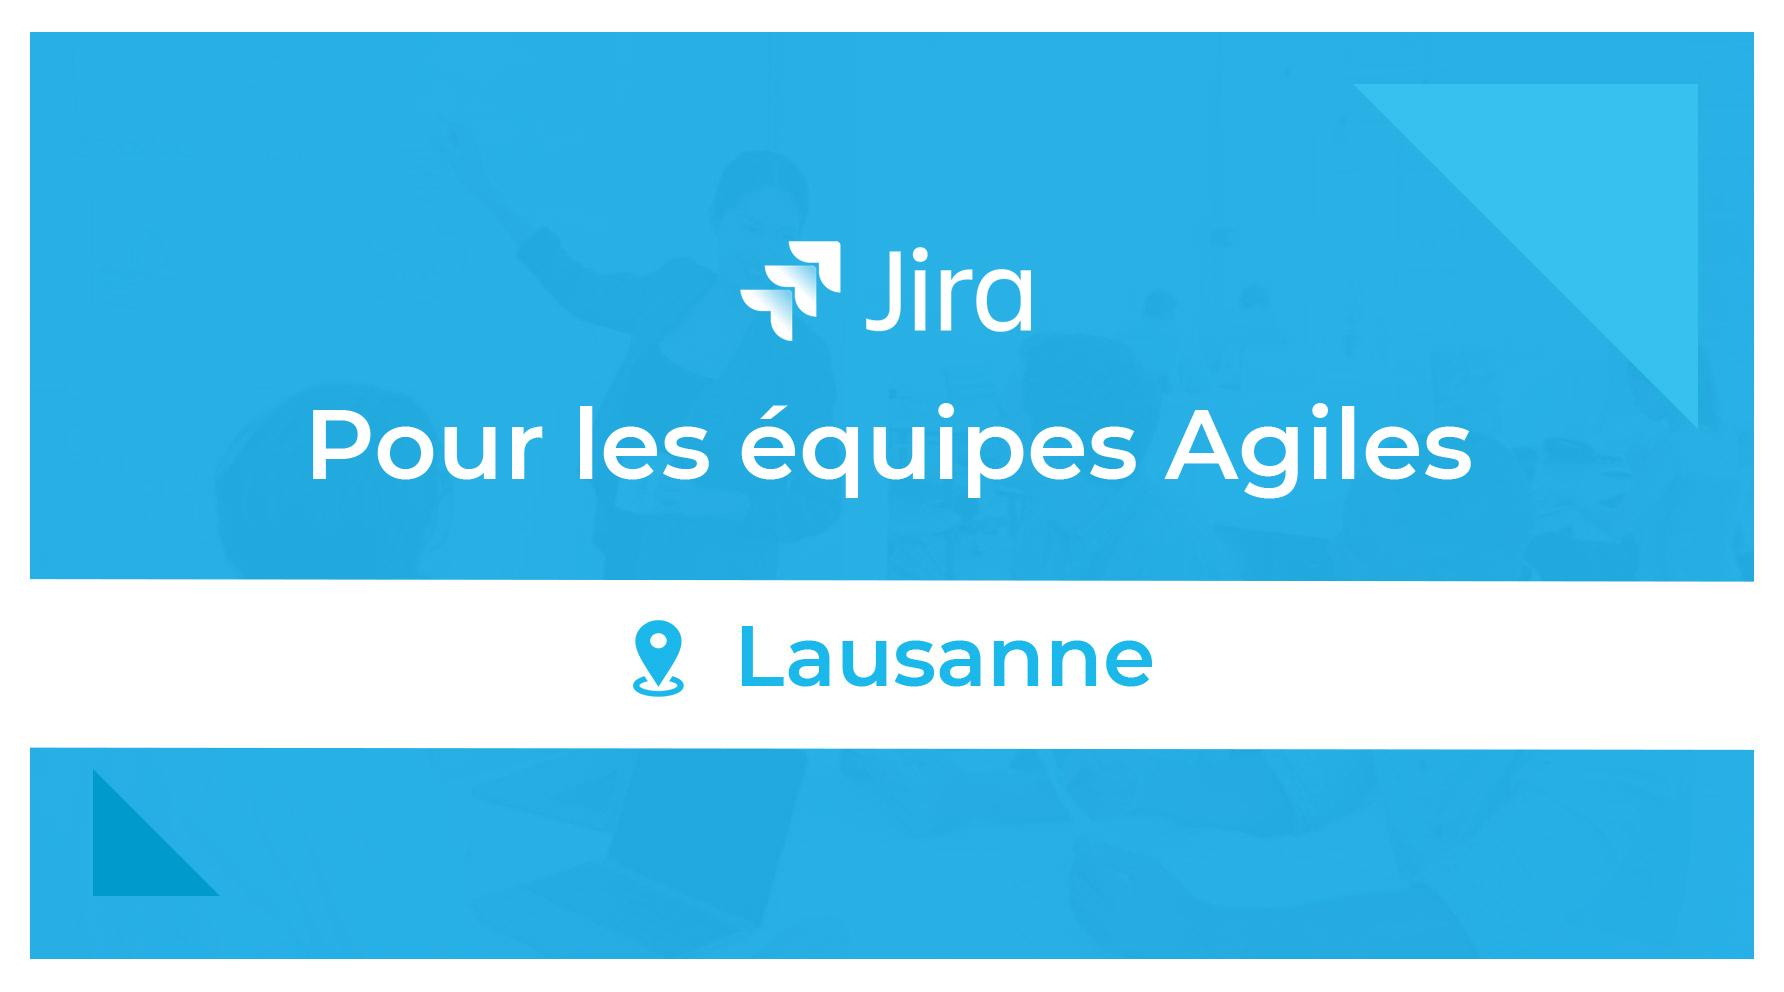 Jira Equipe Agile Lausanne